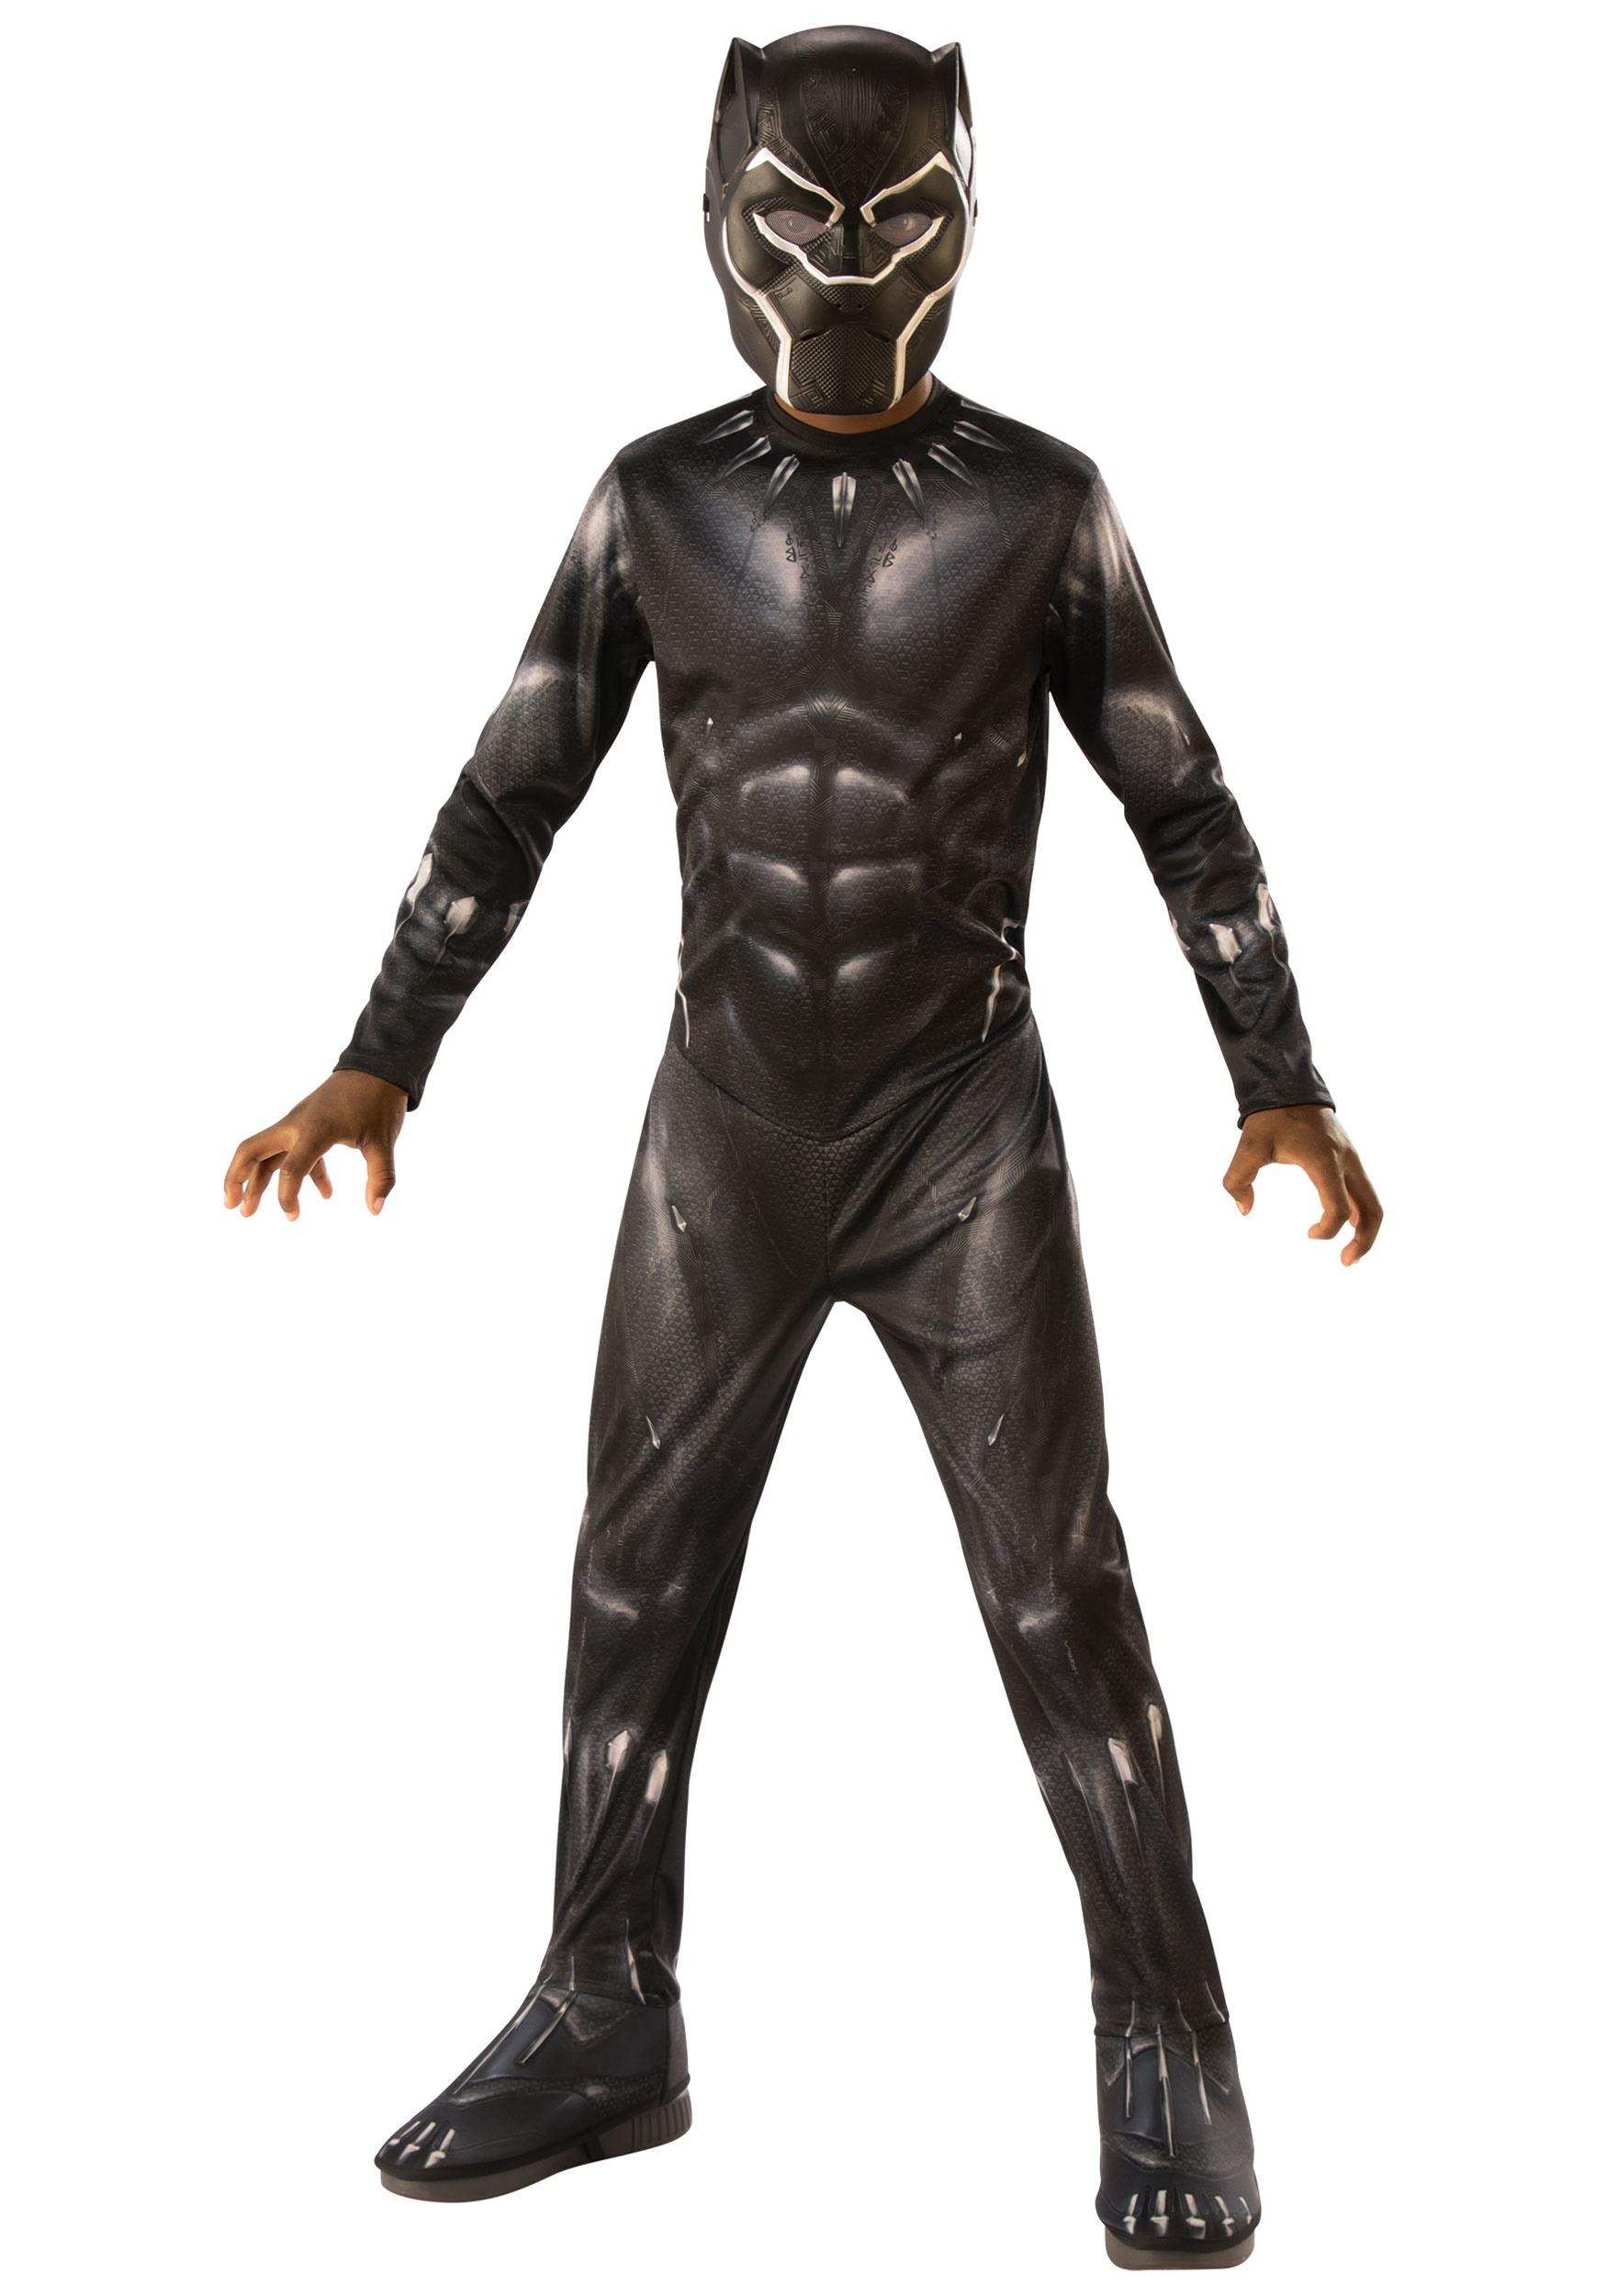 Black Panther Costume for Children RU641046